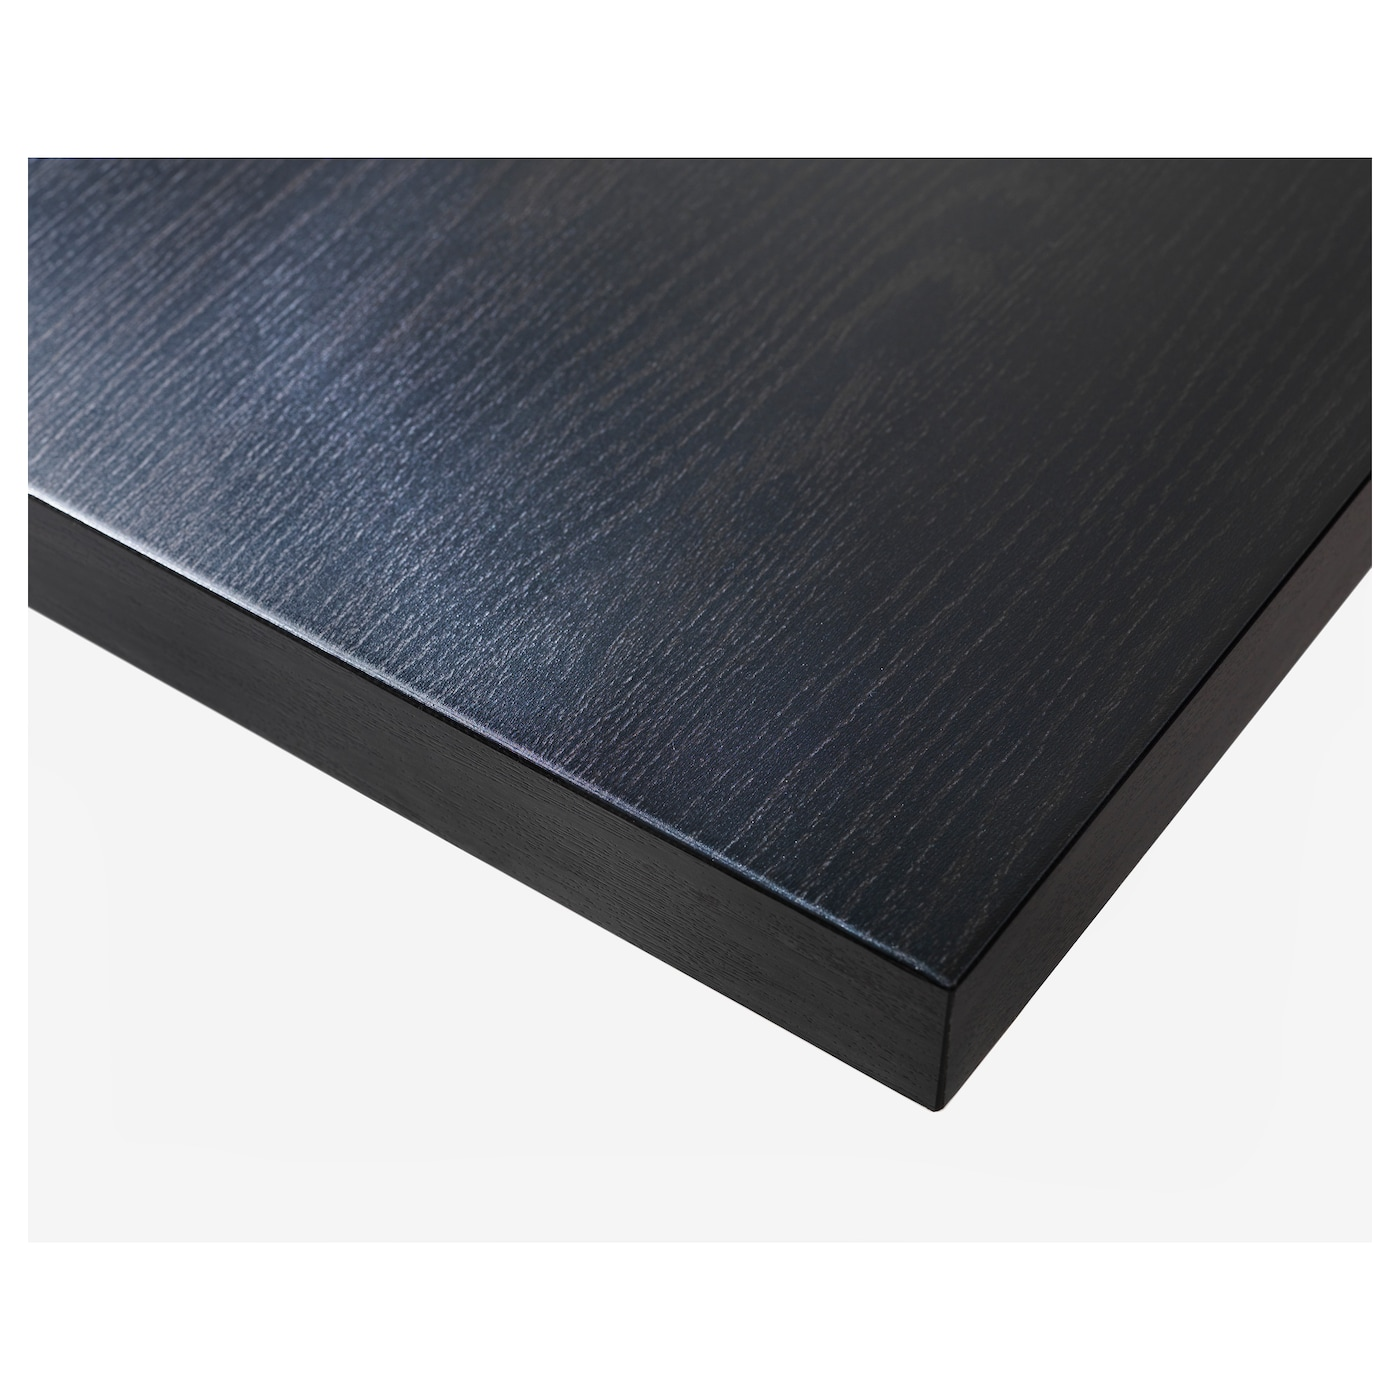 linnmon tafelblad zwartbruin 200 x 60 cm ikea. Black Bedroom Furniture Sets. Home Design Ideas